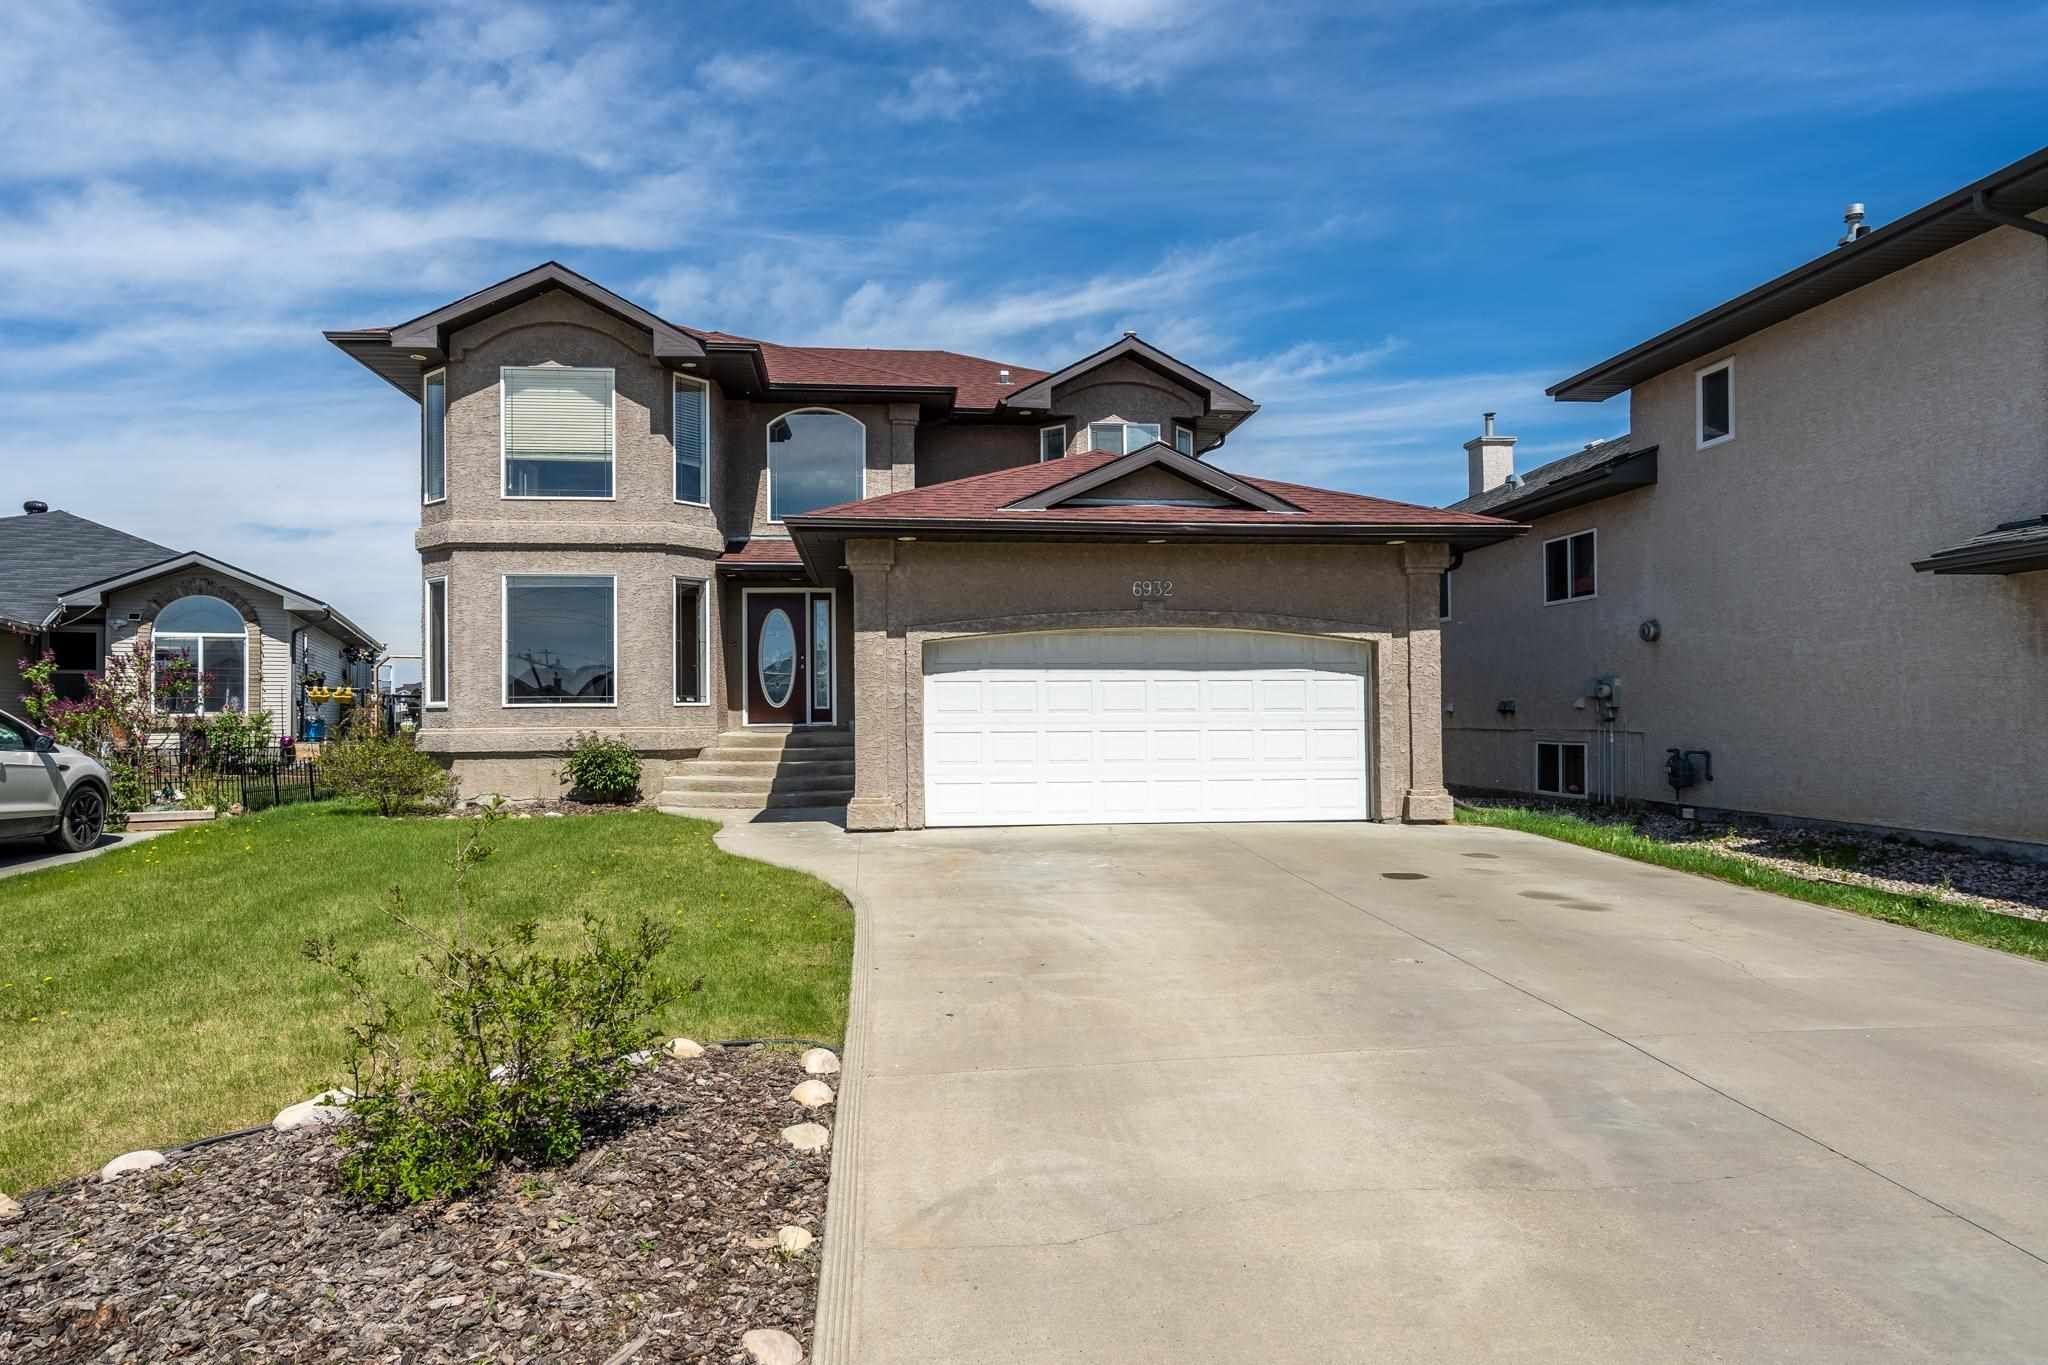 Main Photo: 6932 164 Avenue in Edmonton: Zone 28 House for sale : MLS®# E4232525